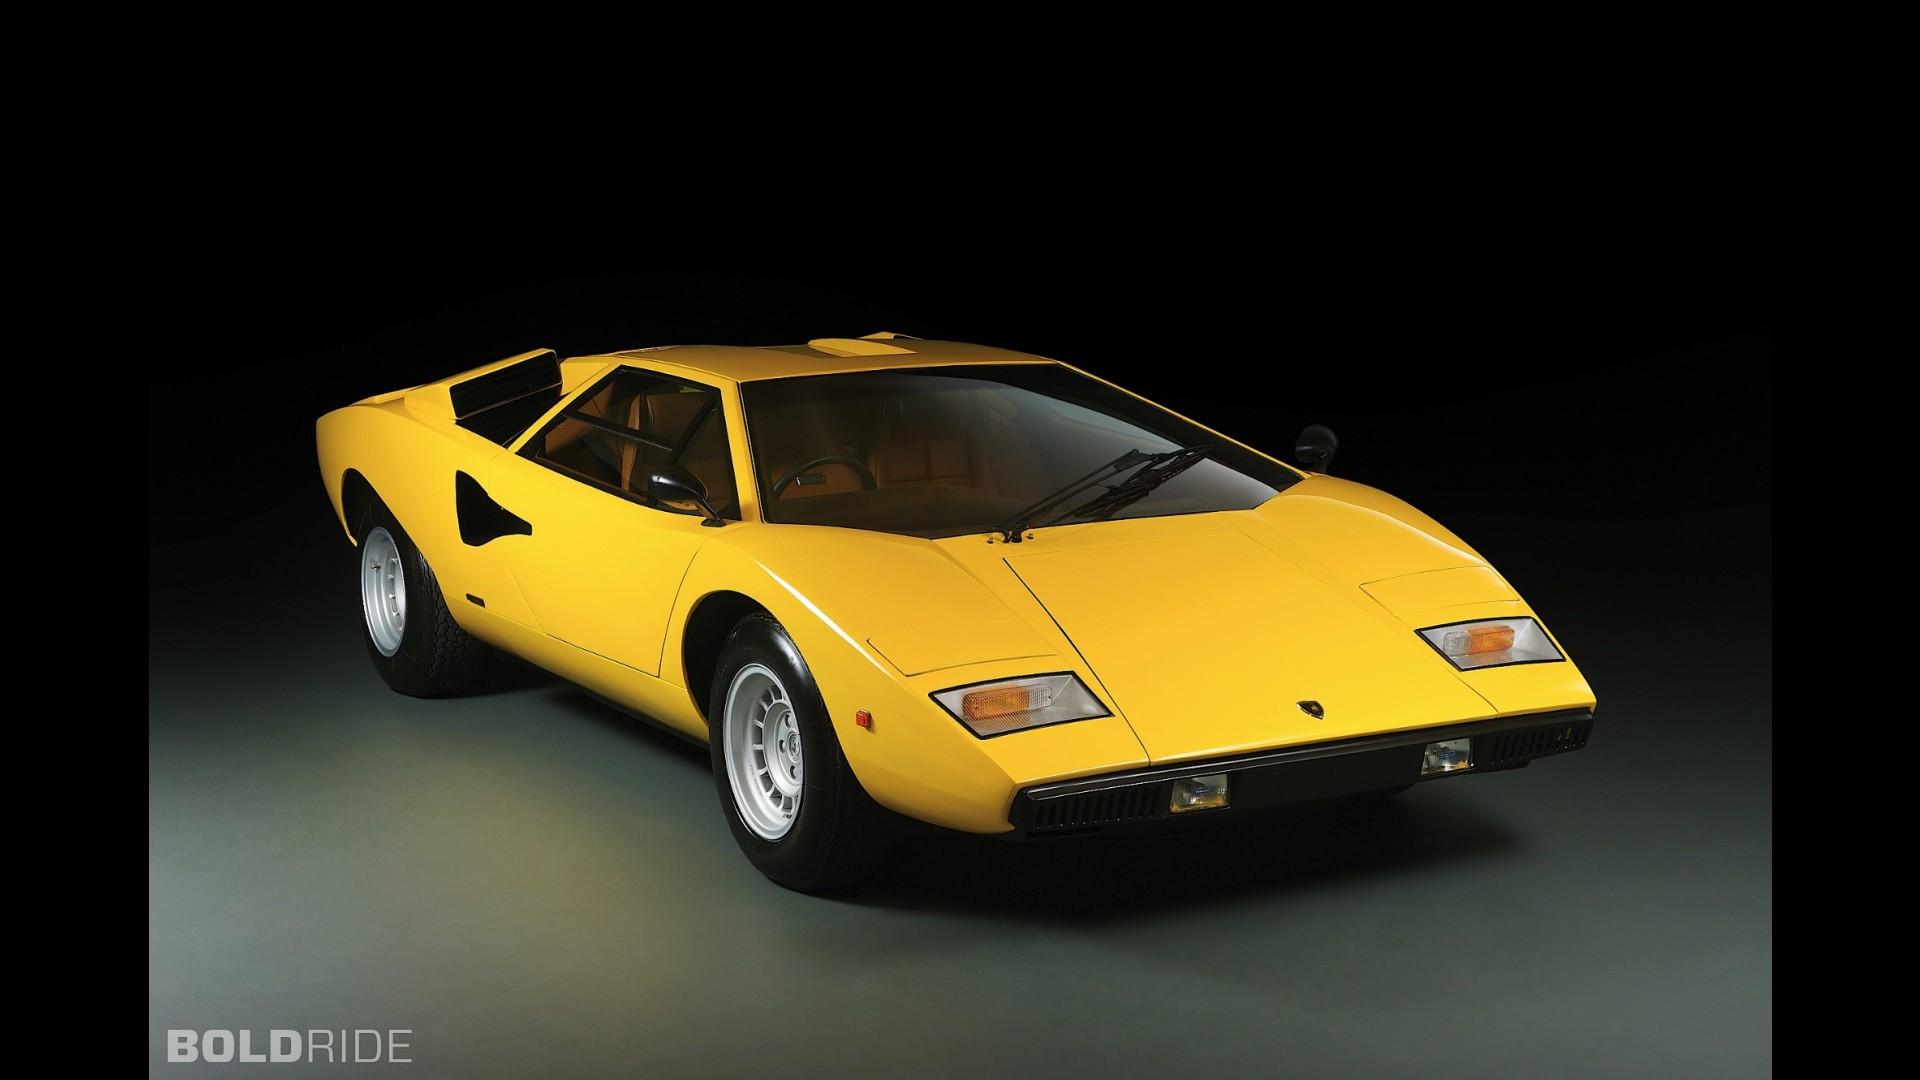 lamborghini-countach-lp400-periscopo Exciting Lamborghini Countach Nfs Most Wanted Cars Trend